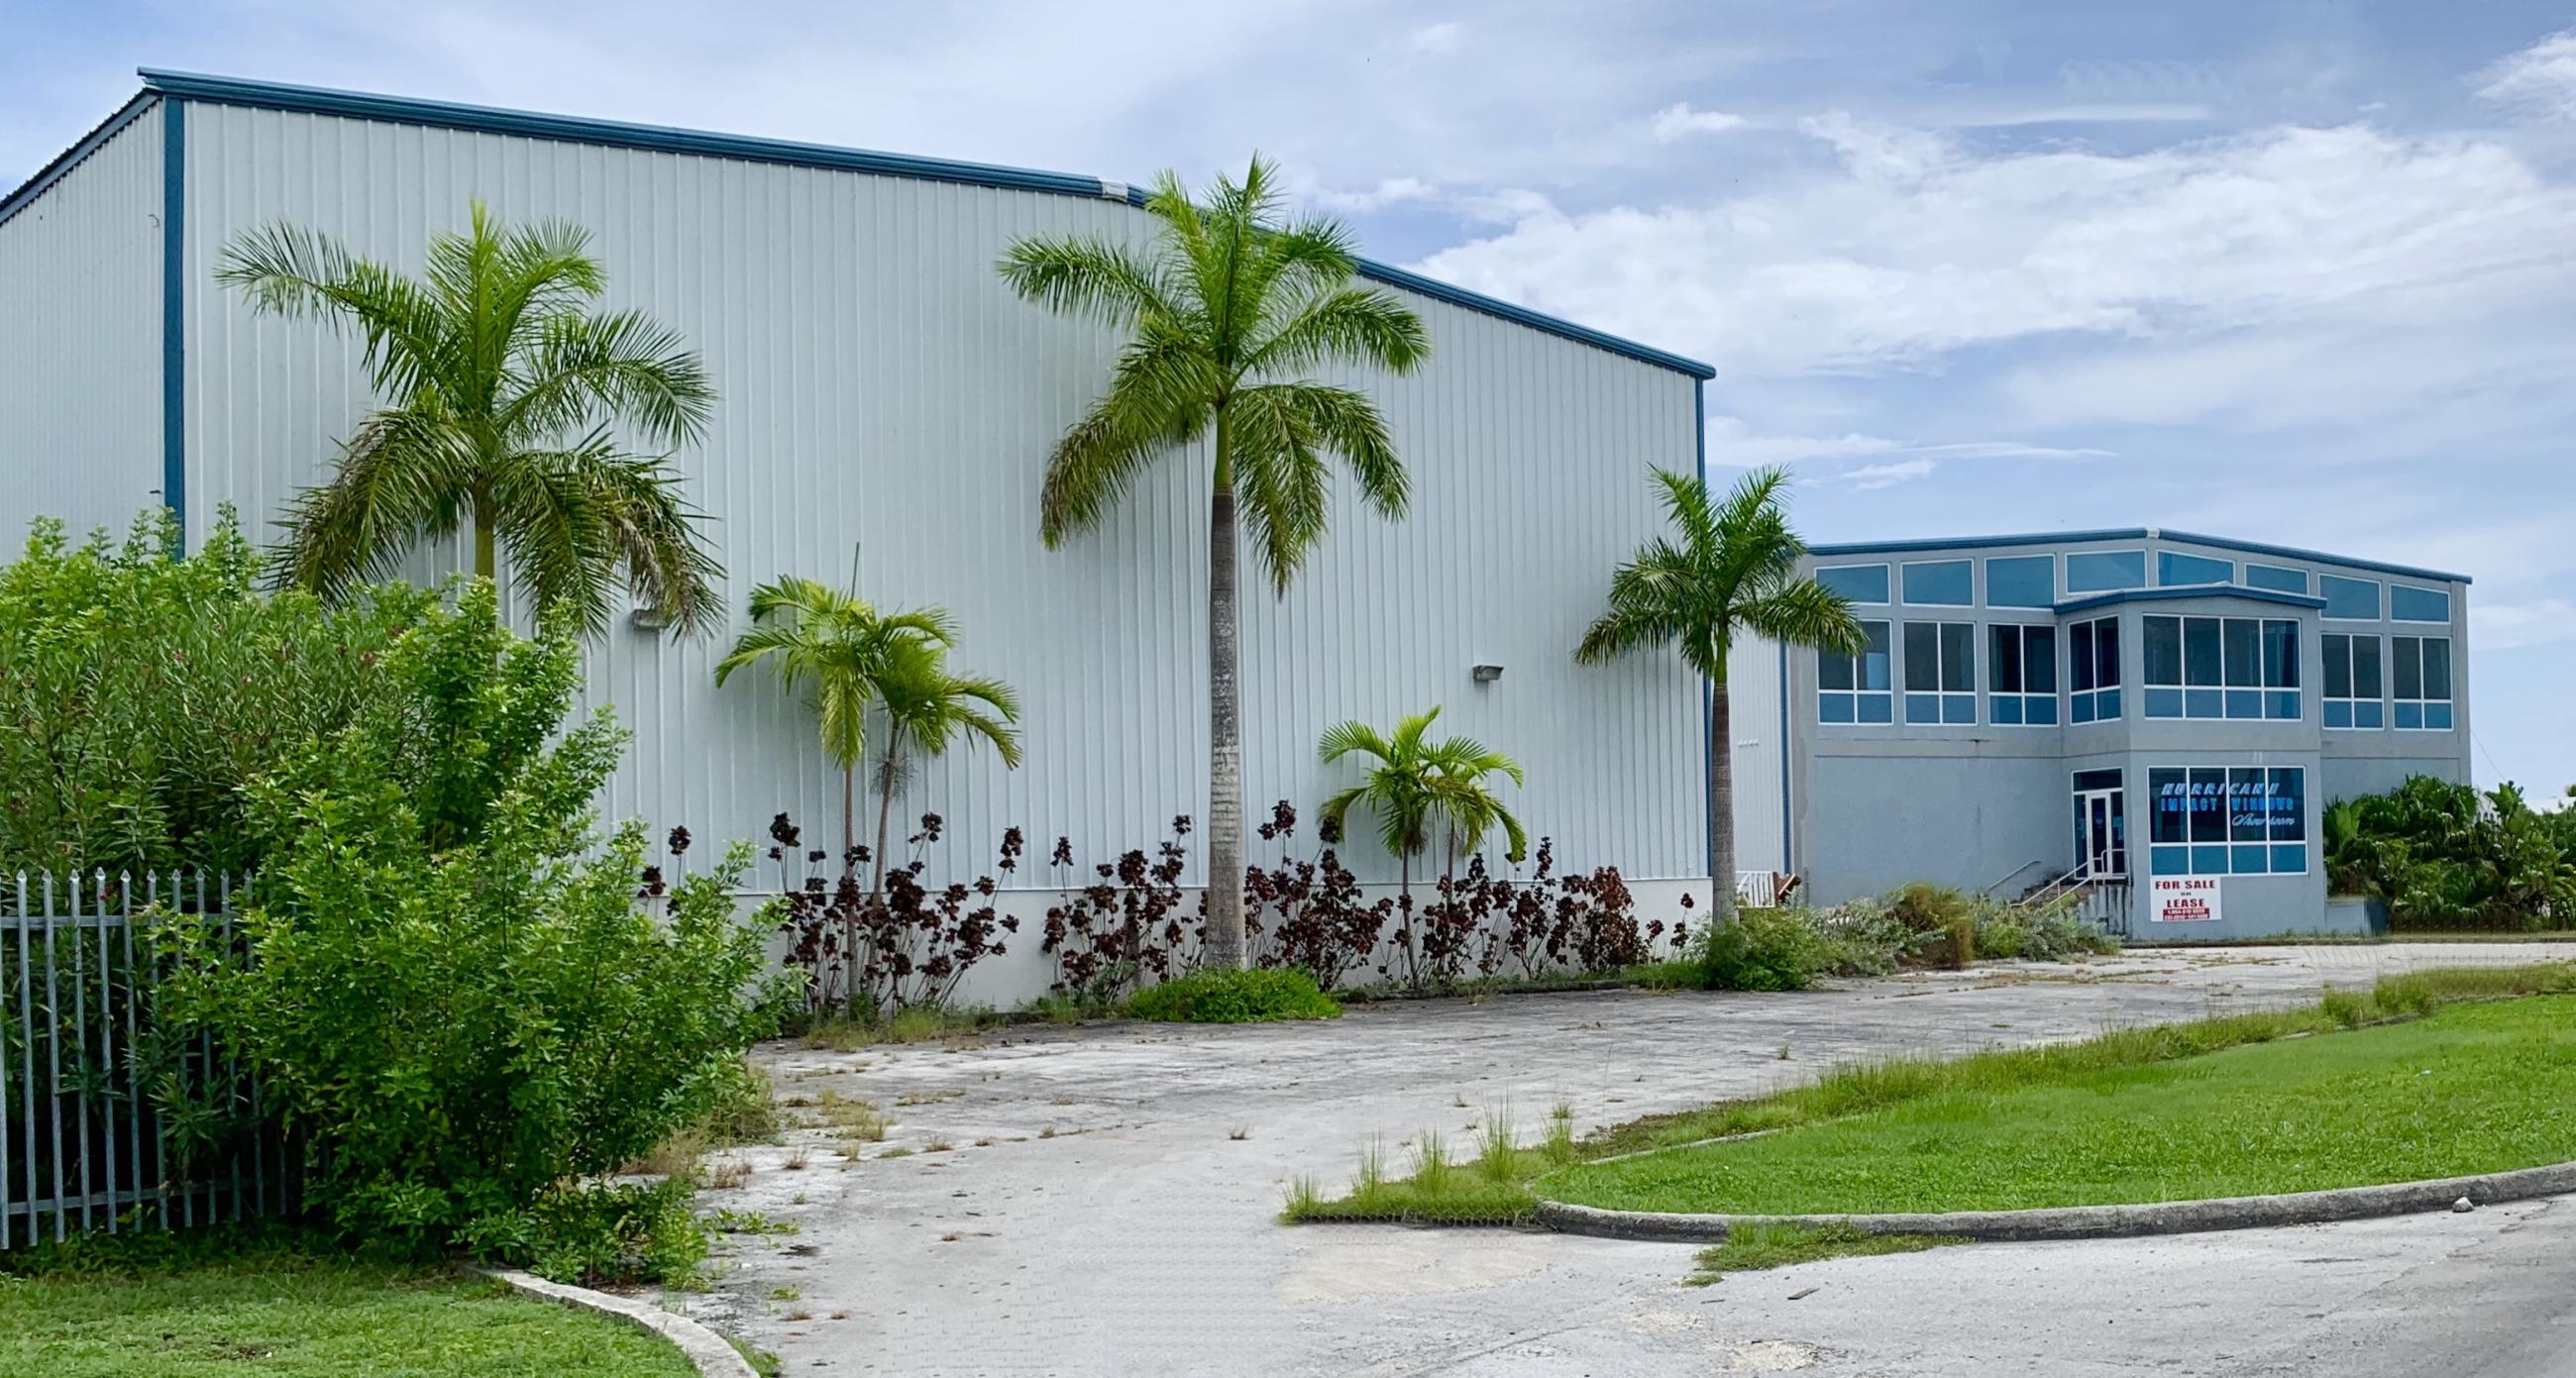 Freeport Warehouses for Sale- Hurricane Dorian Proof!